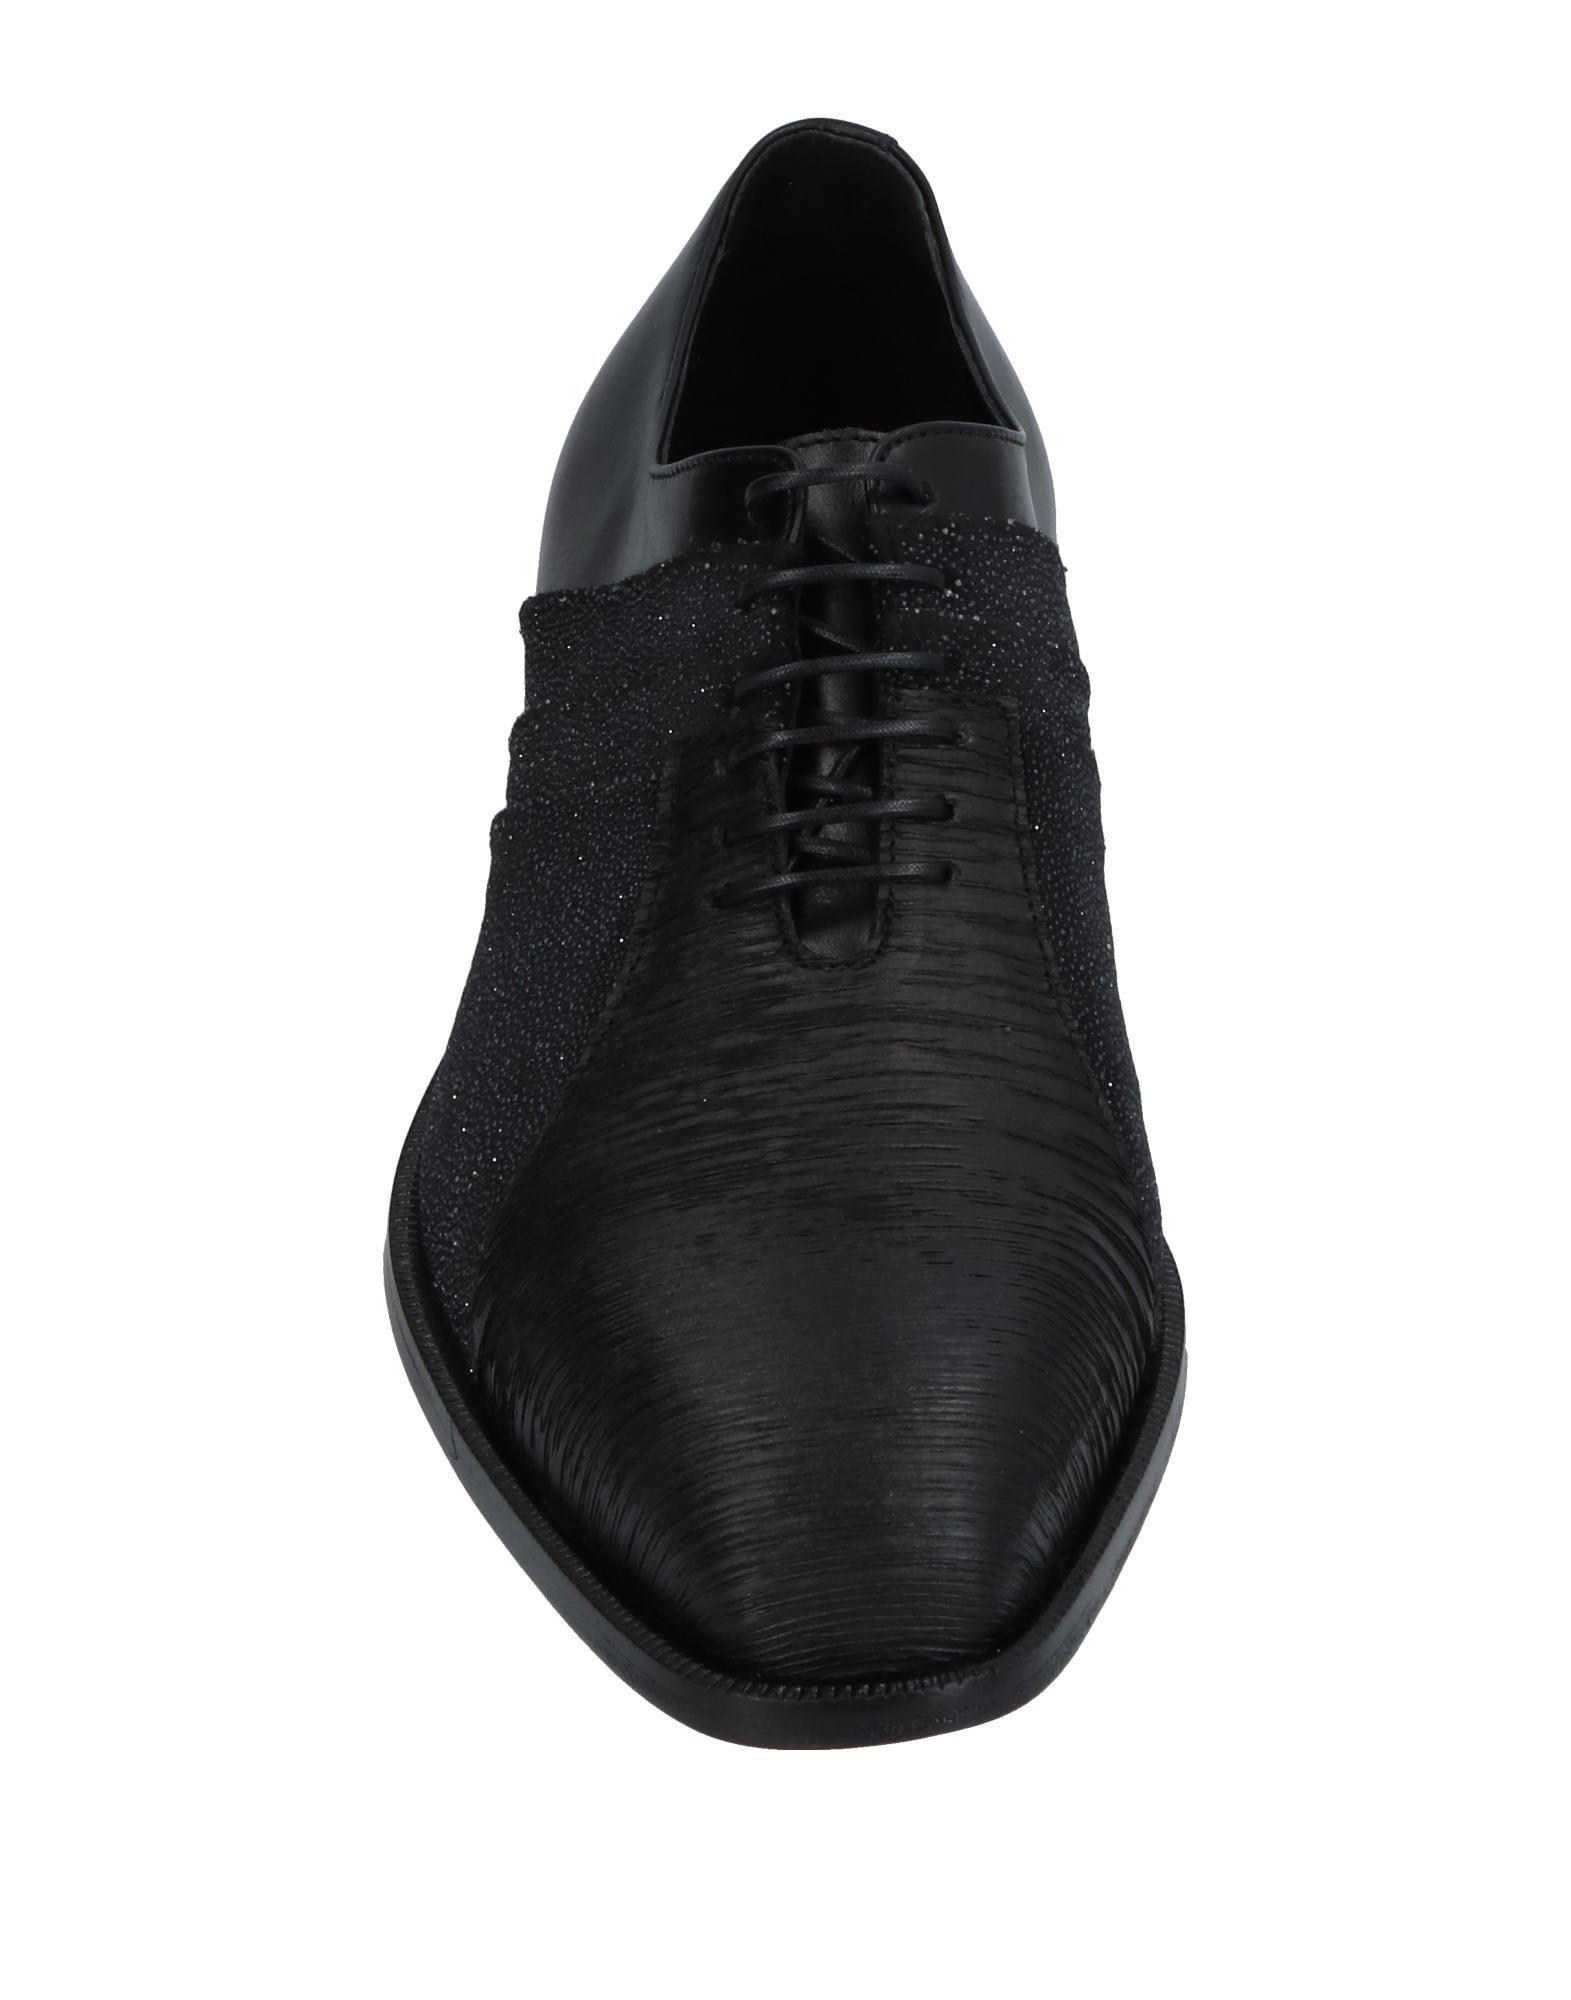 Chaussures À Lacets Giovanni Conti Homme - Chaussures À Lacets Giovanni Conti sur